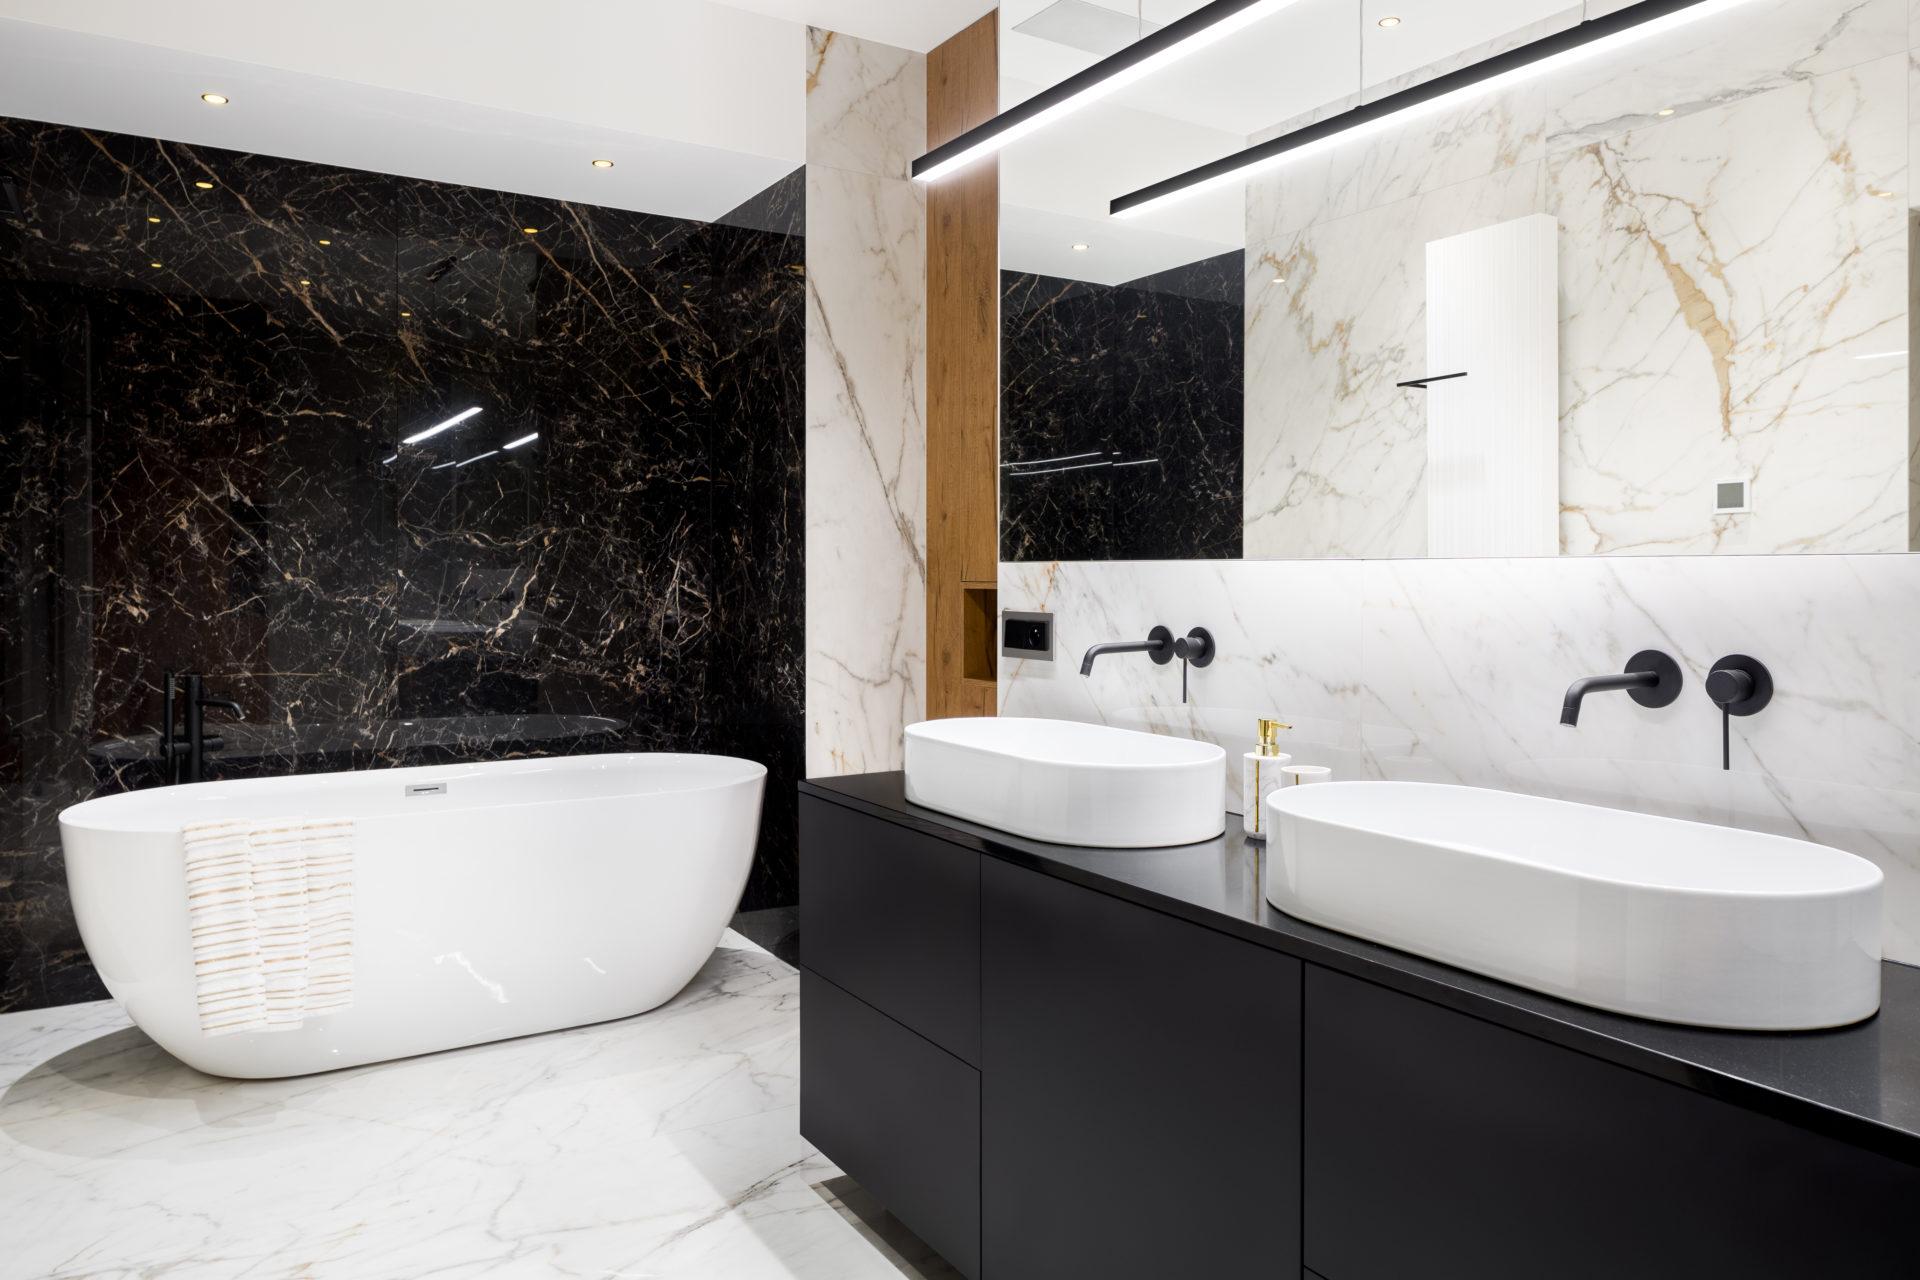 Luxury bathroom with dark and bright marble tiles and big bathtub